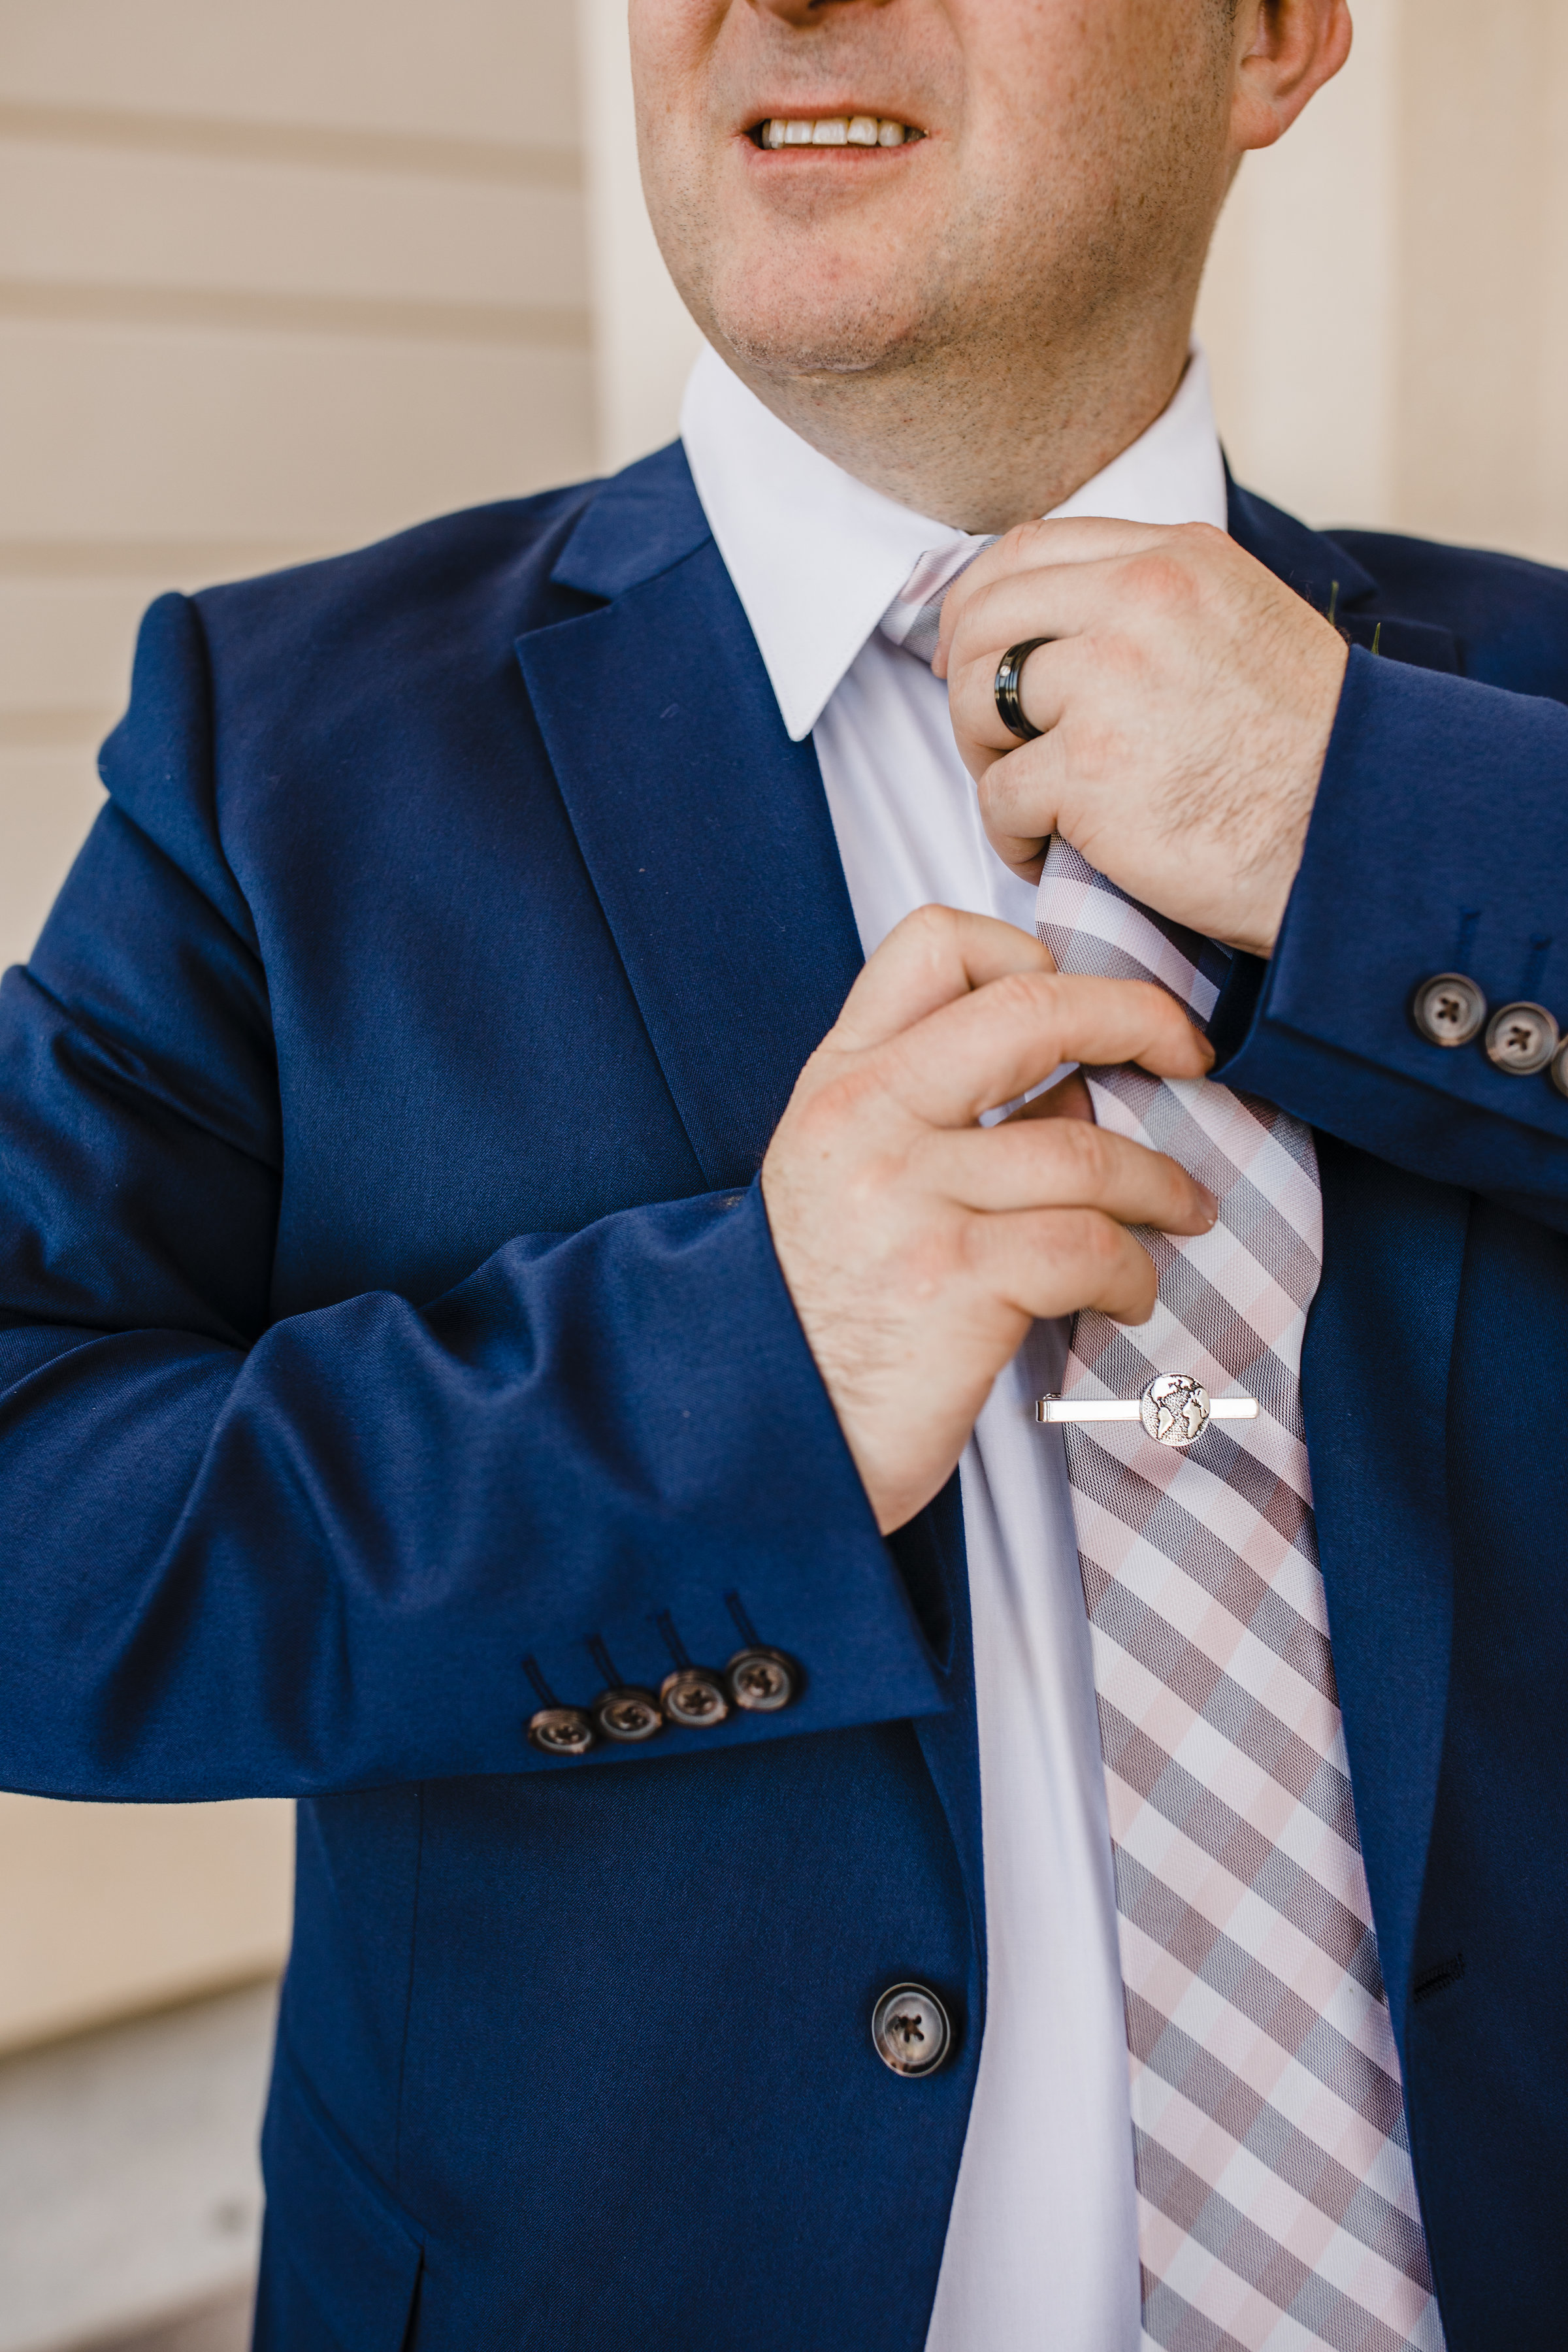 professional wedding photographer in cache valley groom tie navy suit jacket